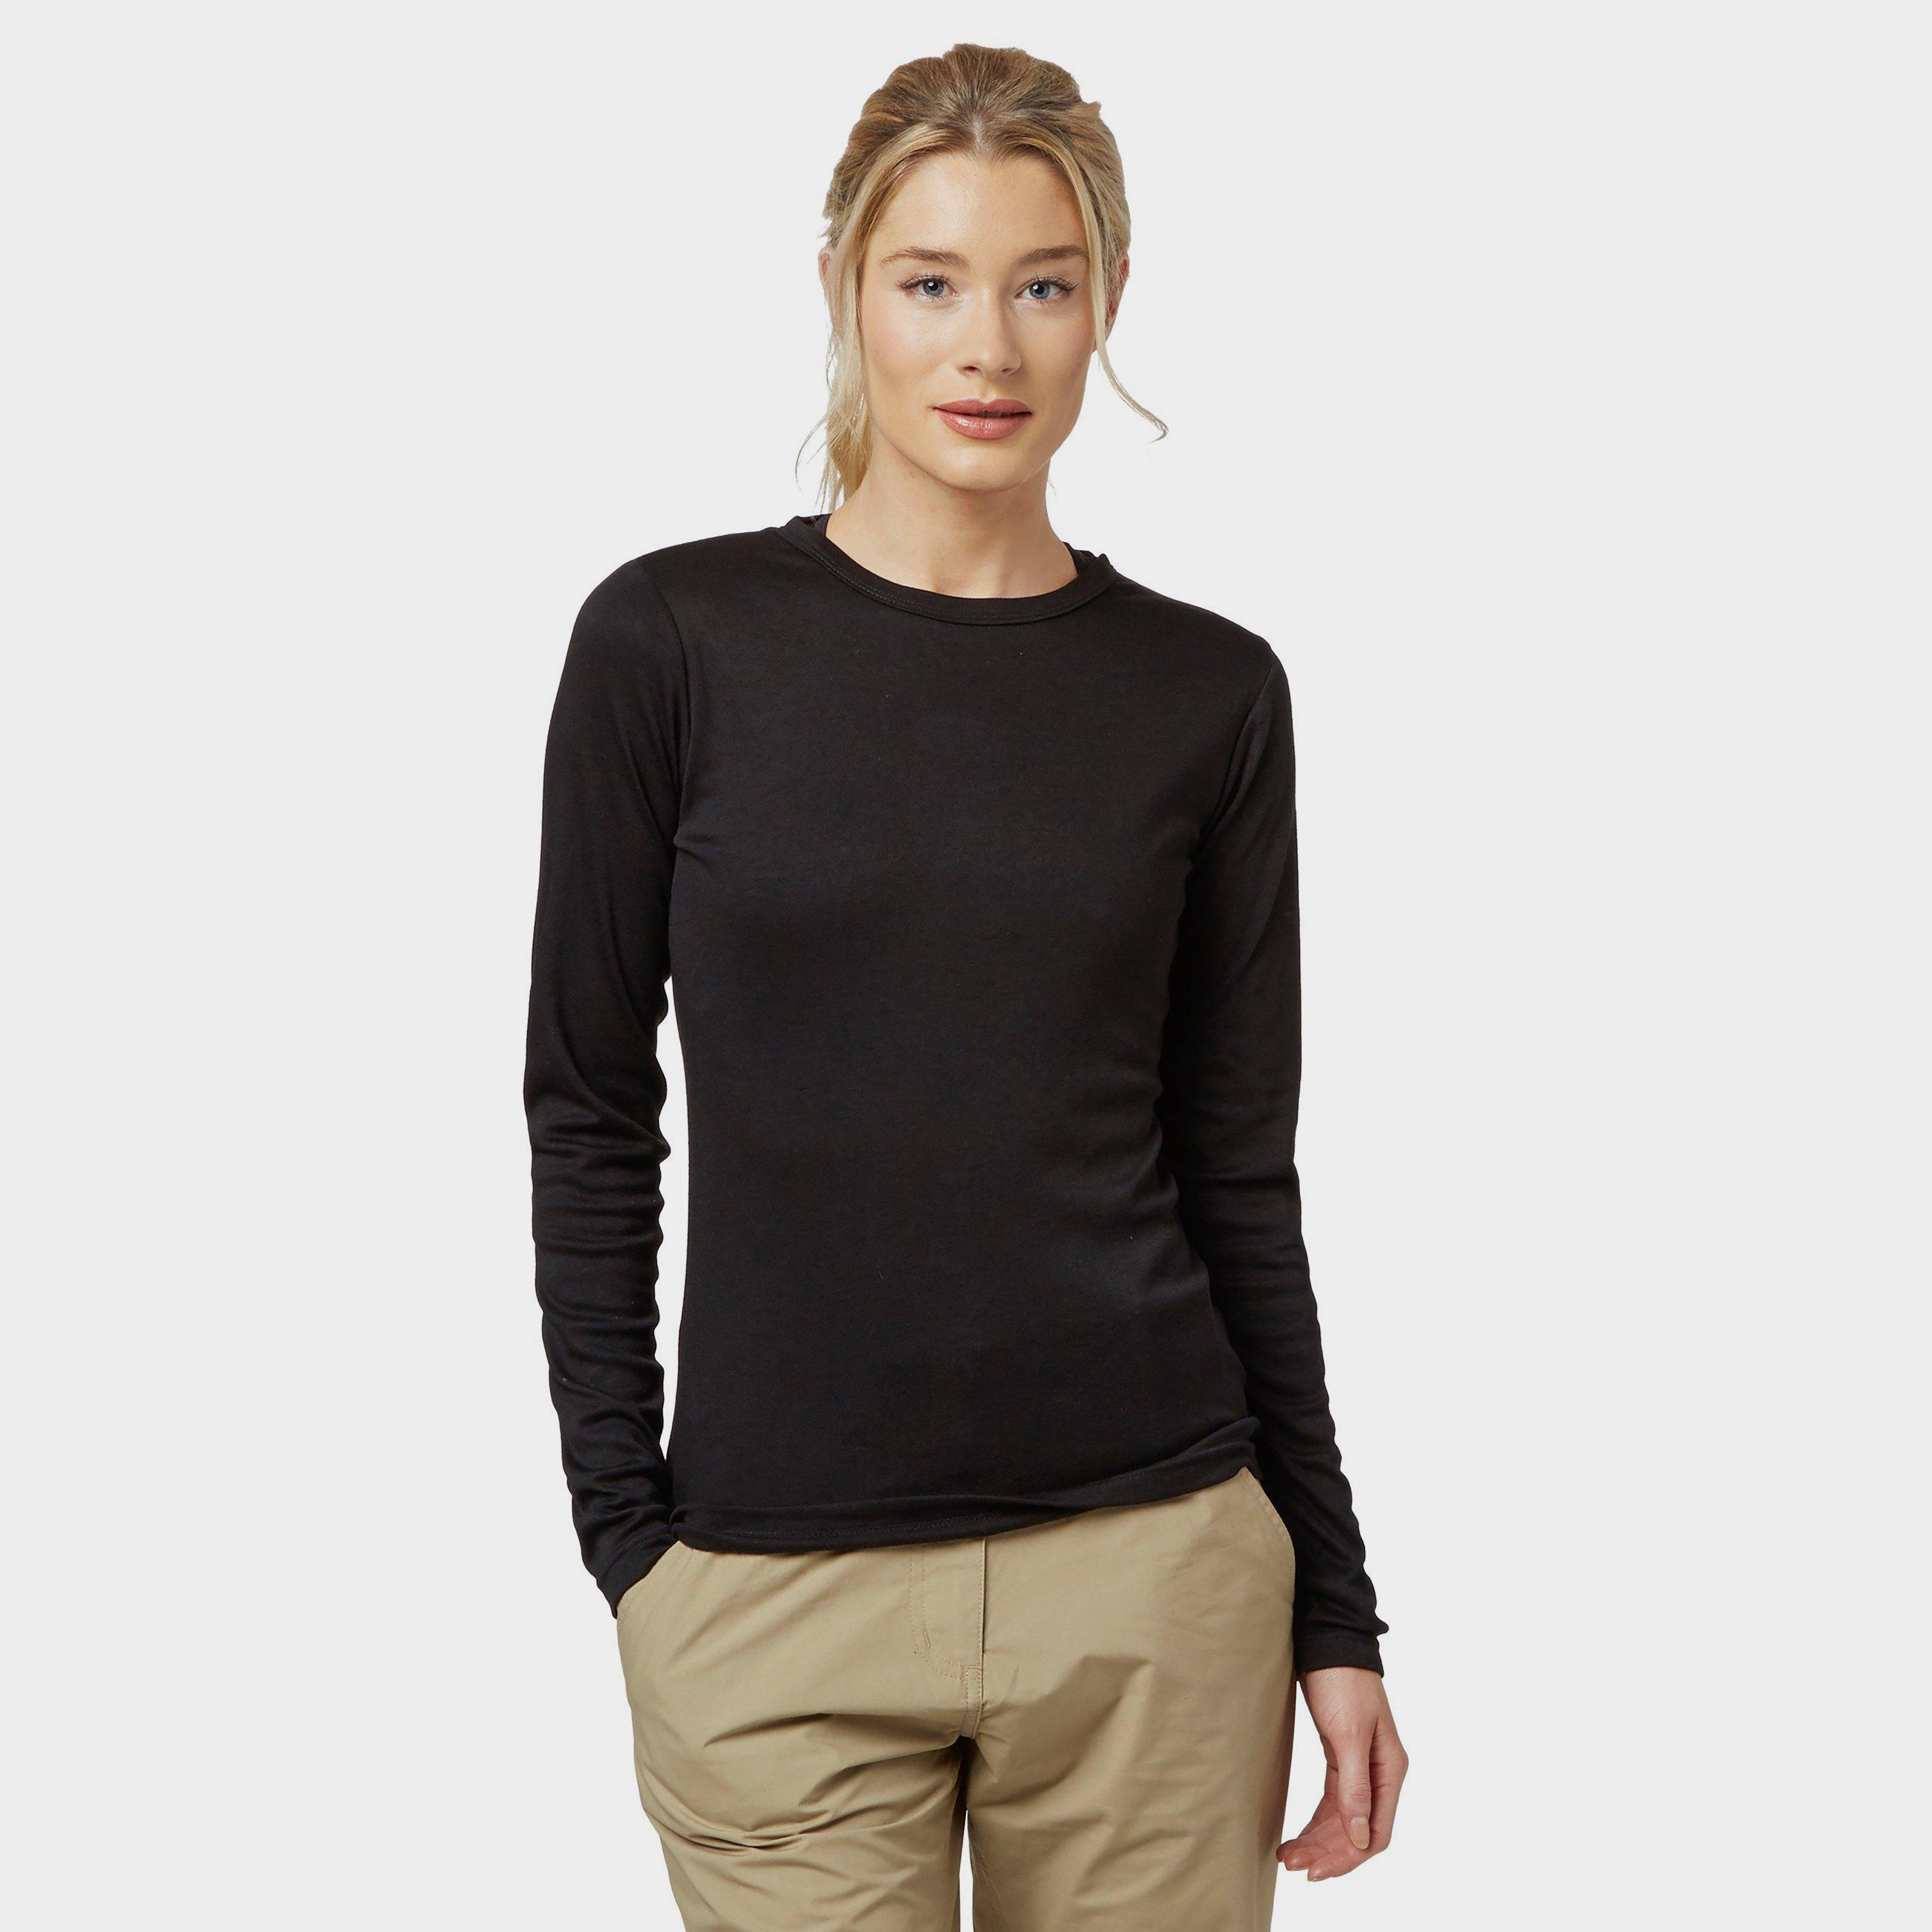 Peter Storm Womens Long Sleeve Thermal Crew Baselayer Black